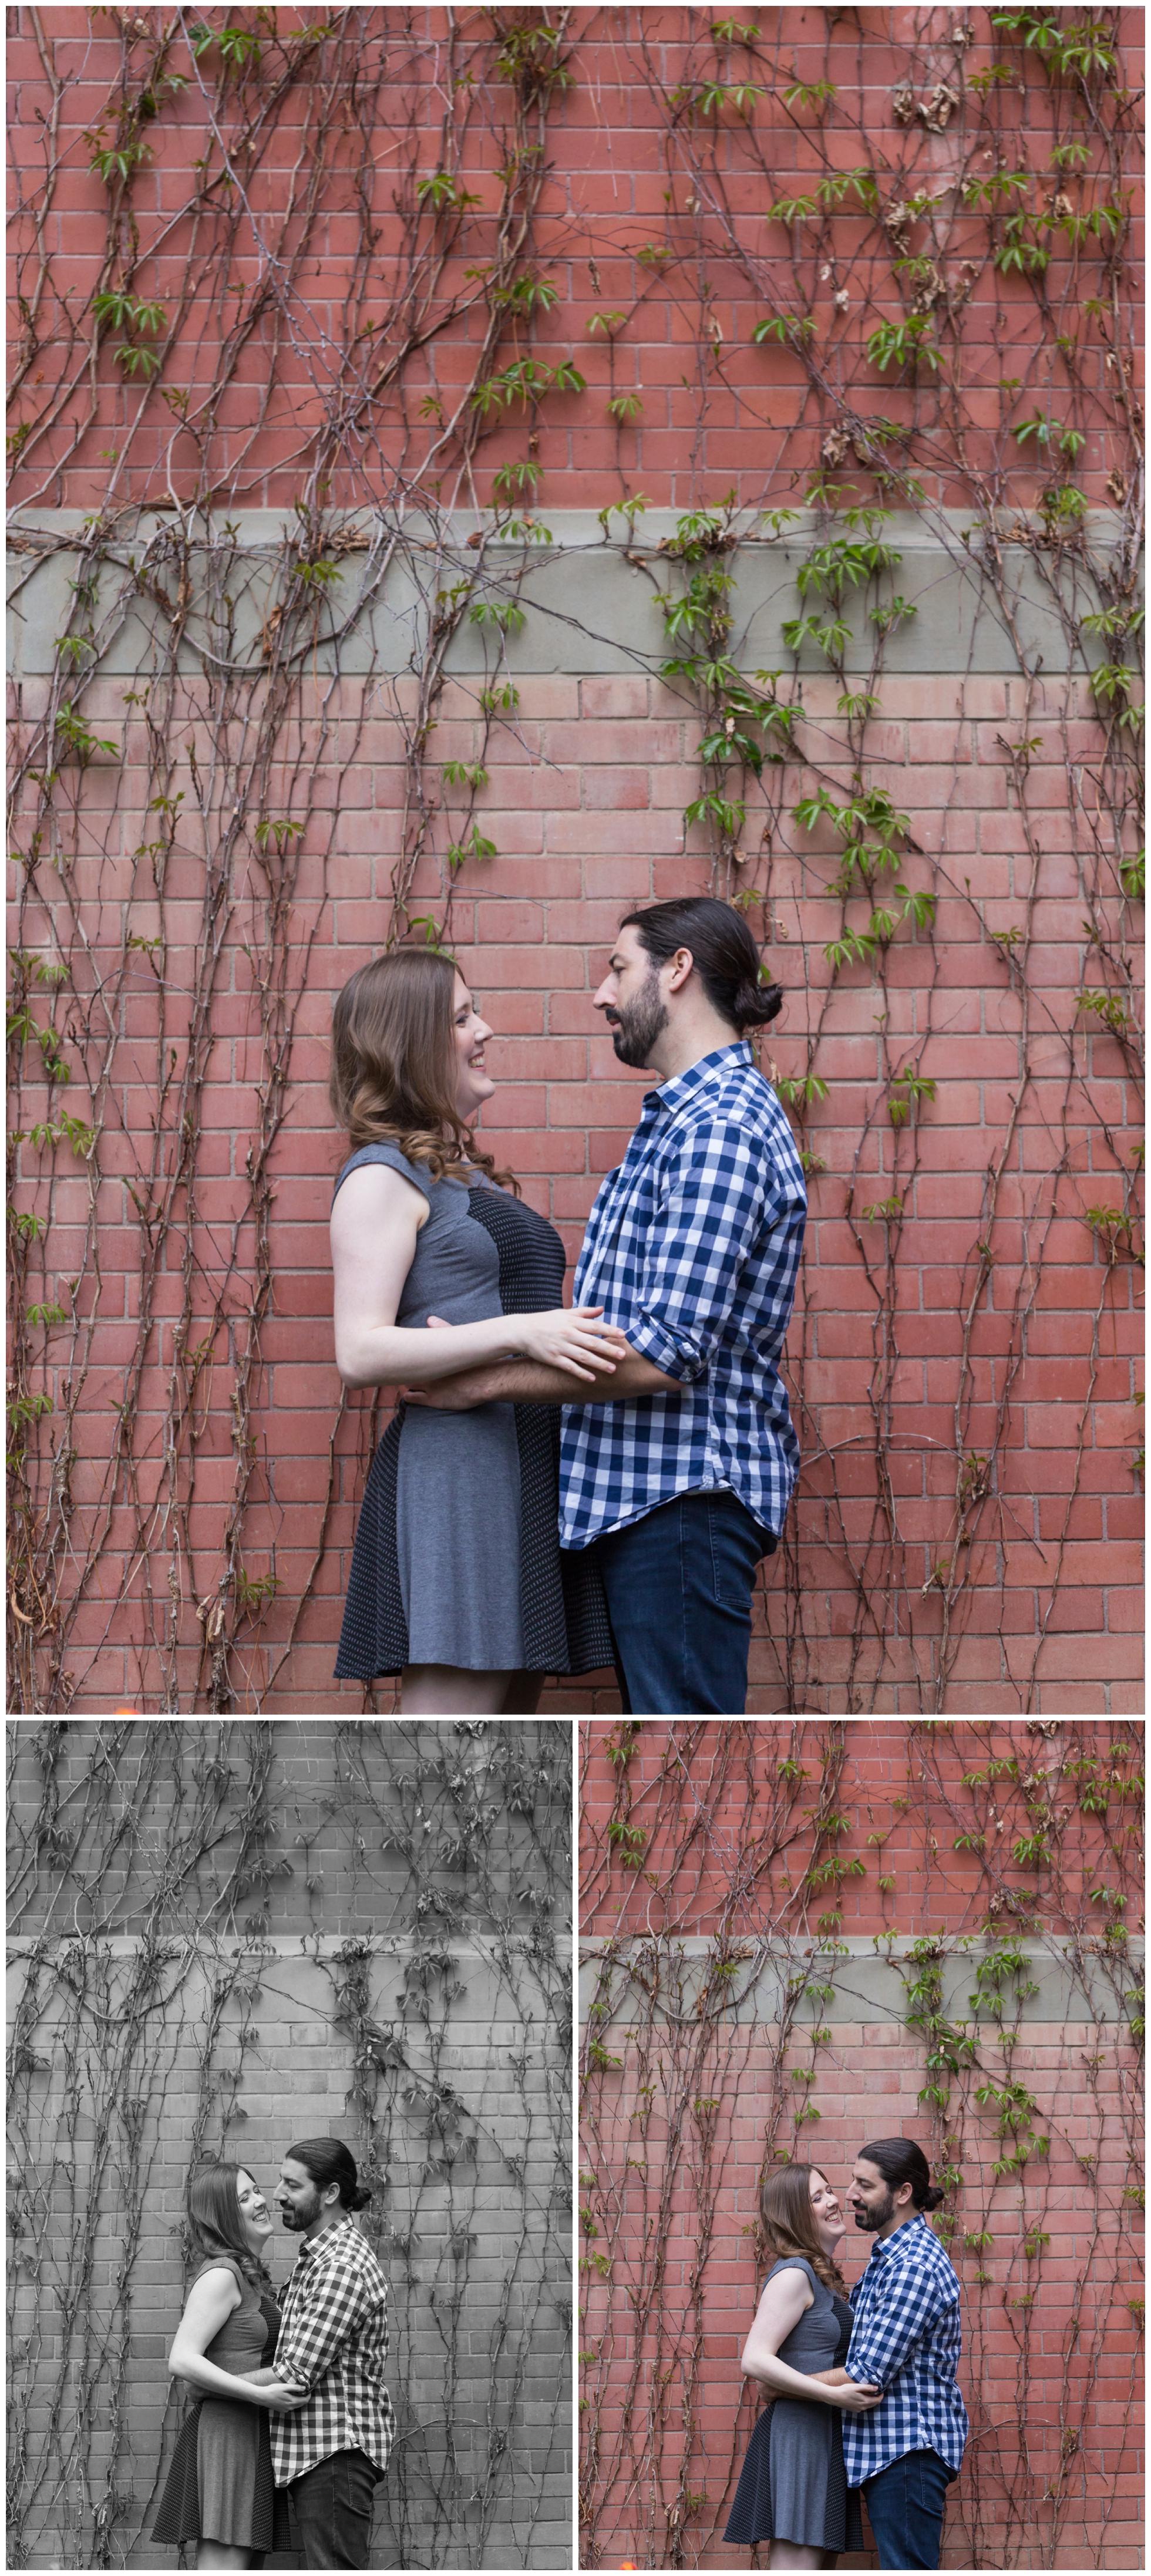 Kate and Jordan Edmonton Engagement Session (Life by Selena Photography)_0012.jpg